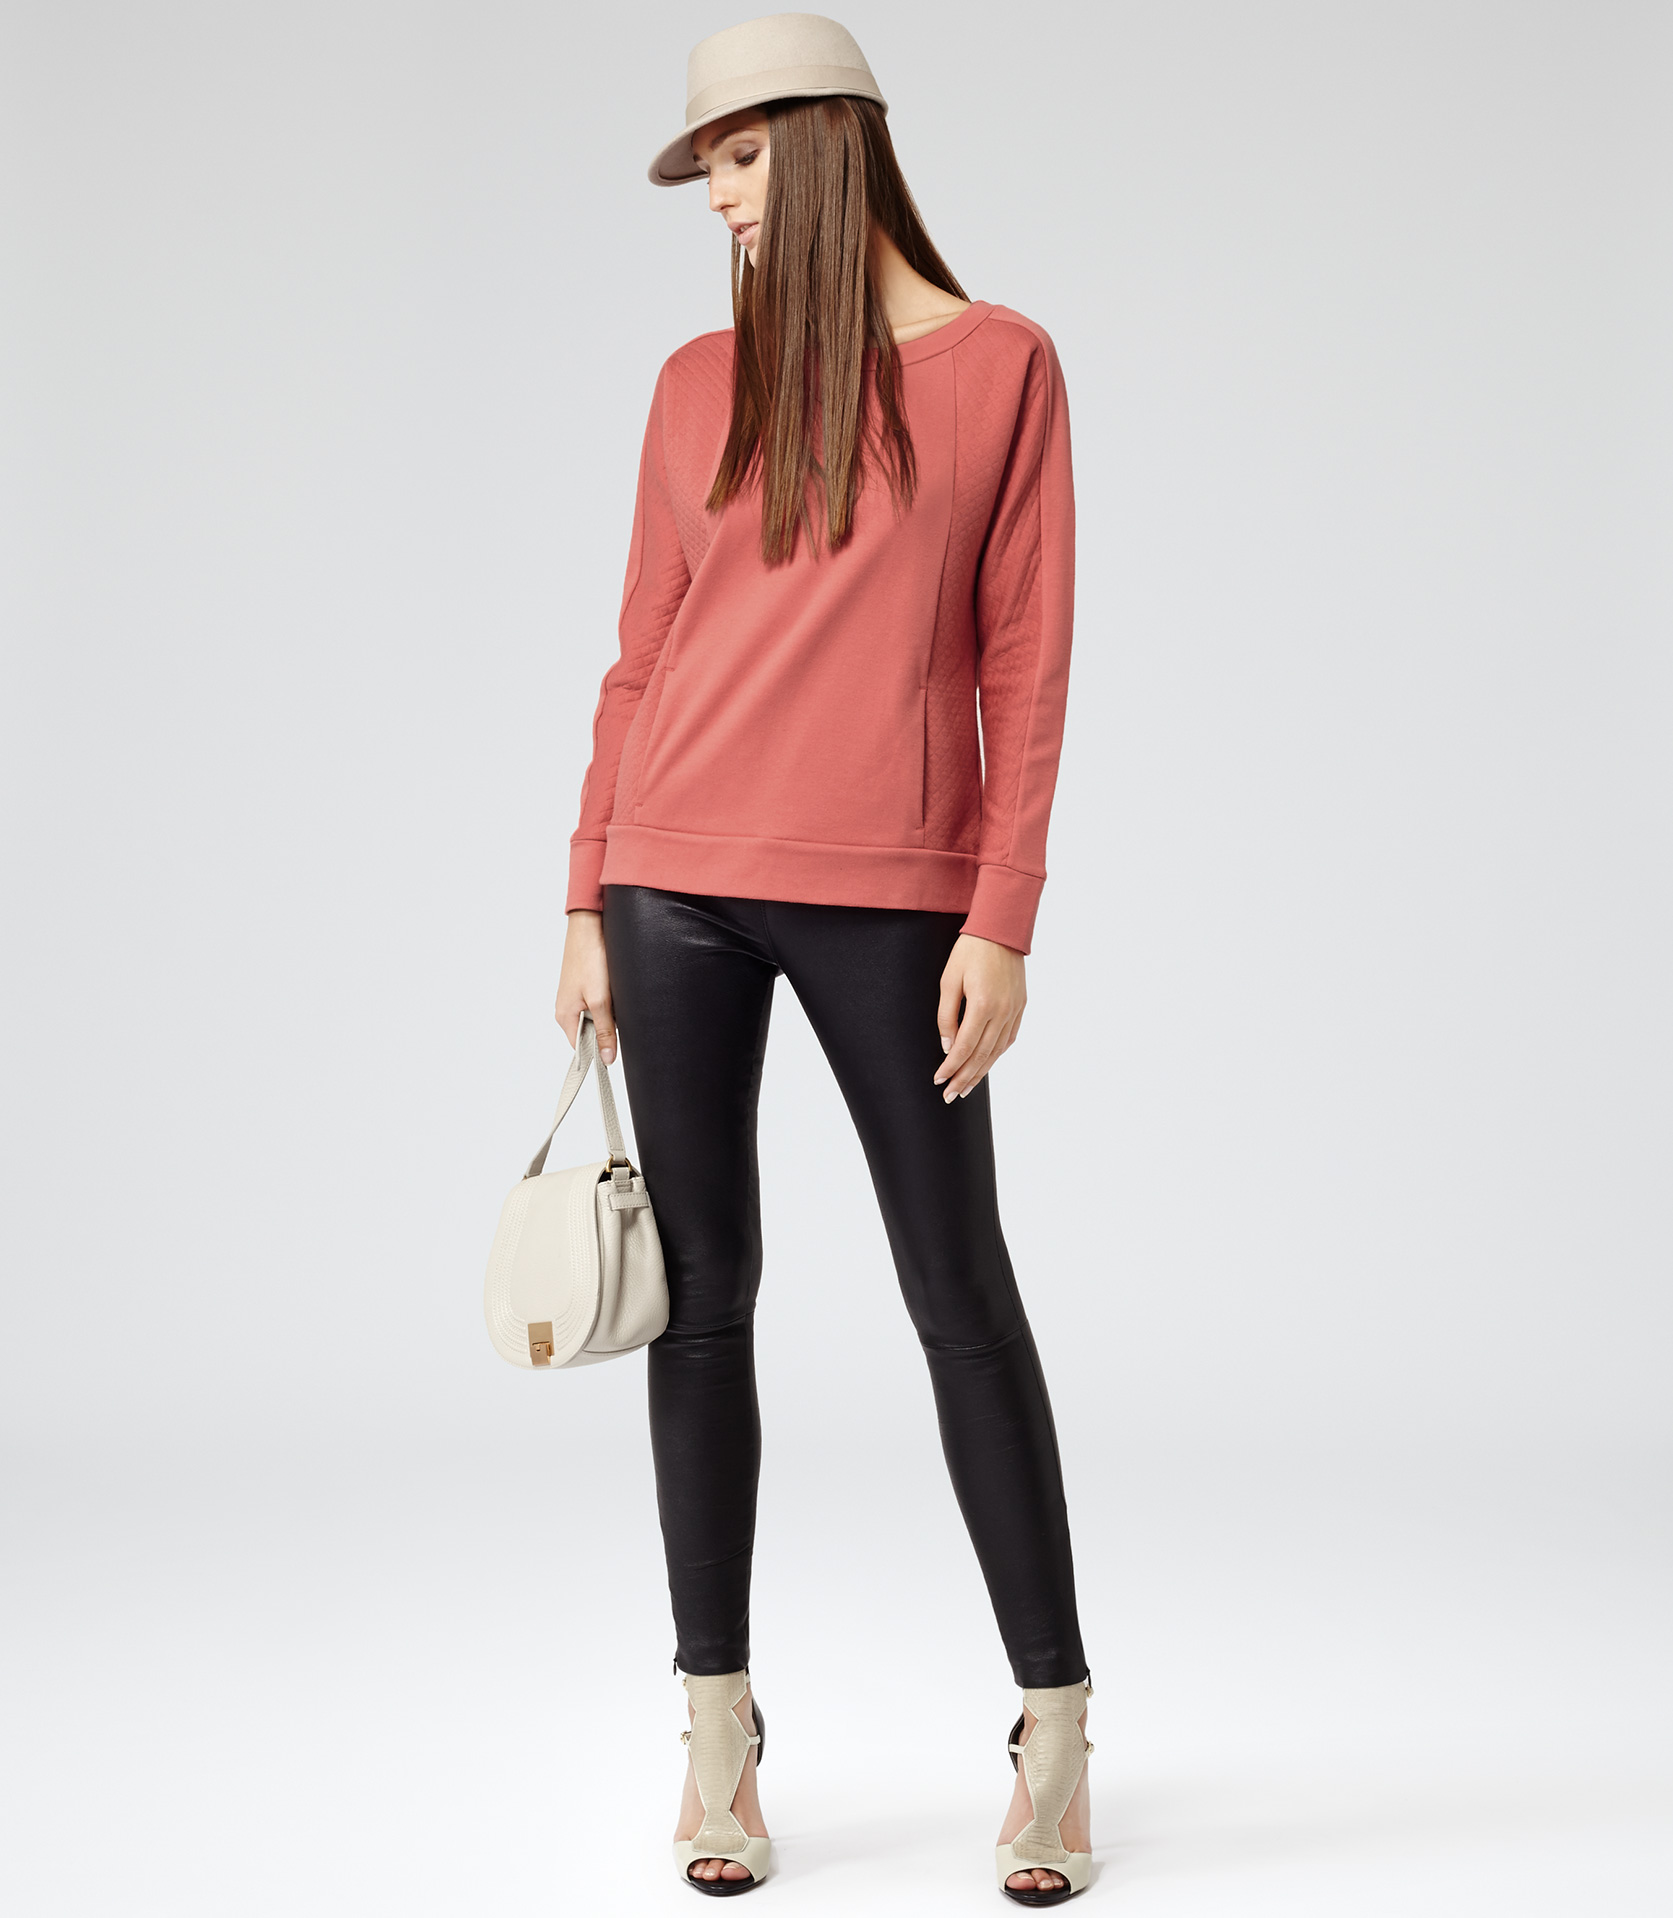 Lyst - Reiss Pisces Quilted Sweatshirt in Pink